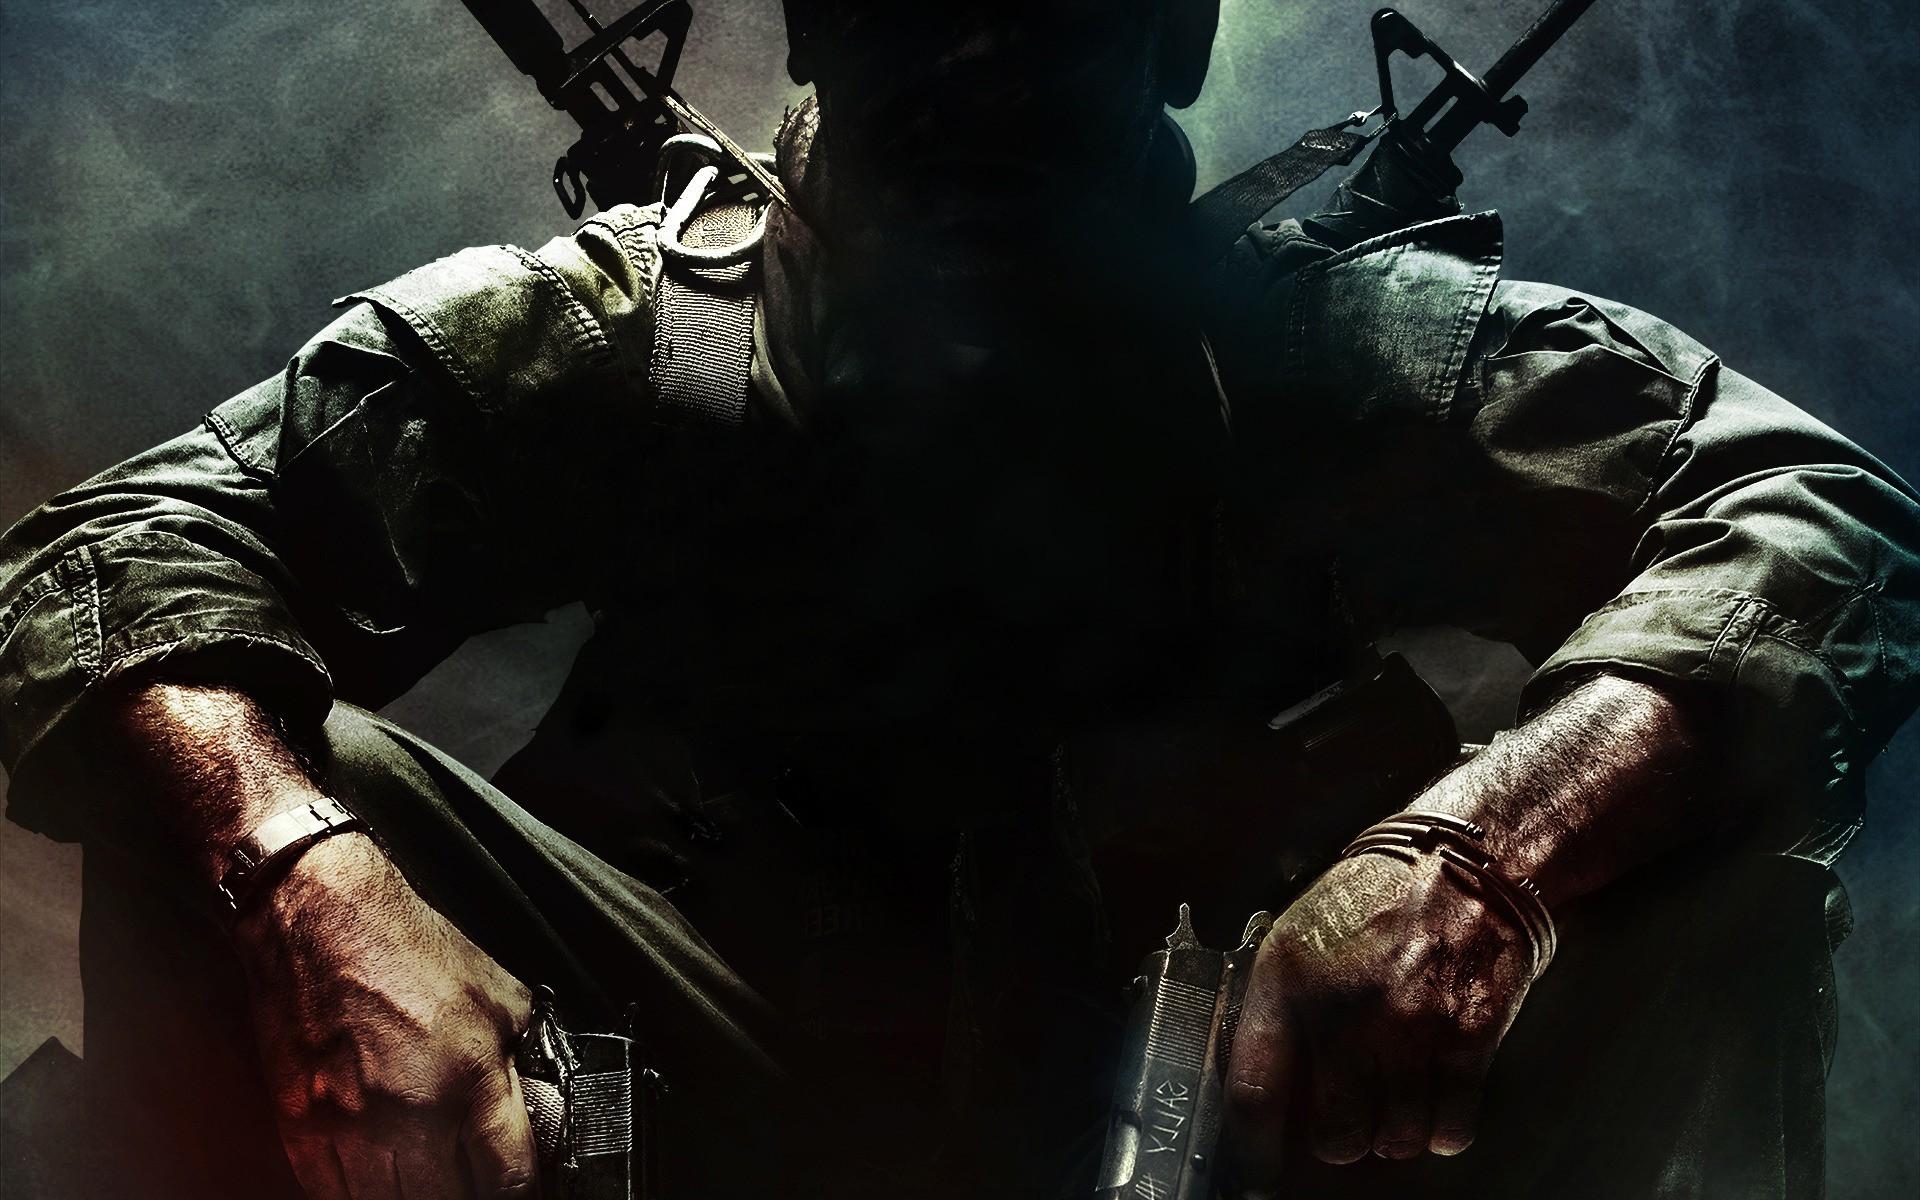 Black Ops 3 Hd Wallpaper: Cod Black Ops Wallpaper